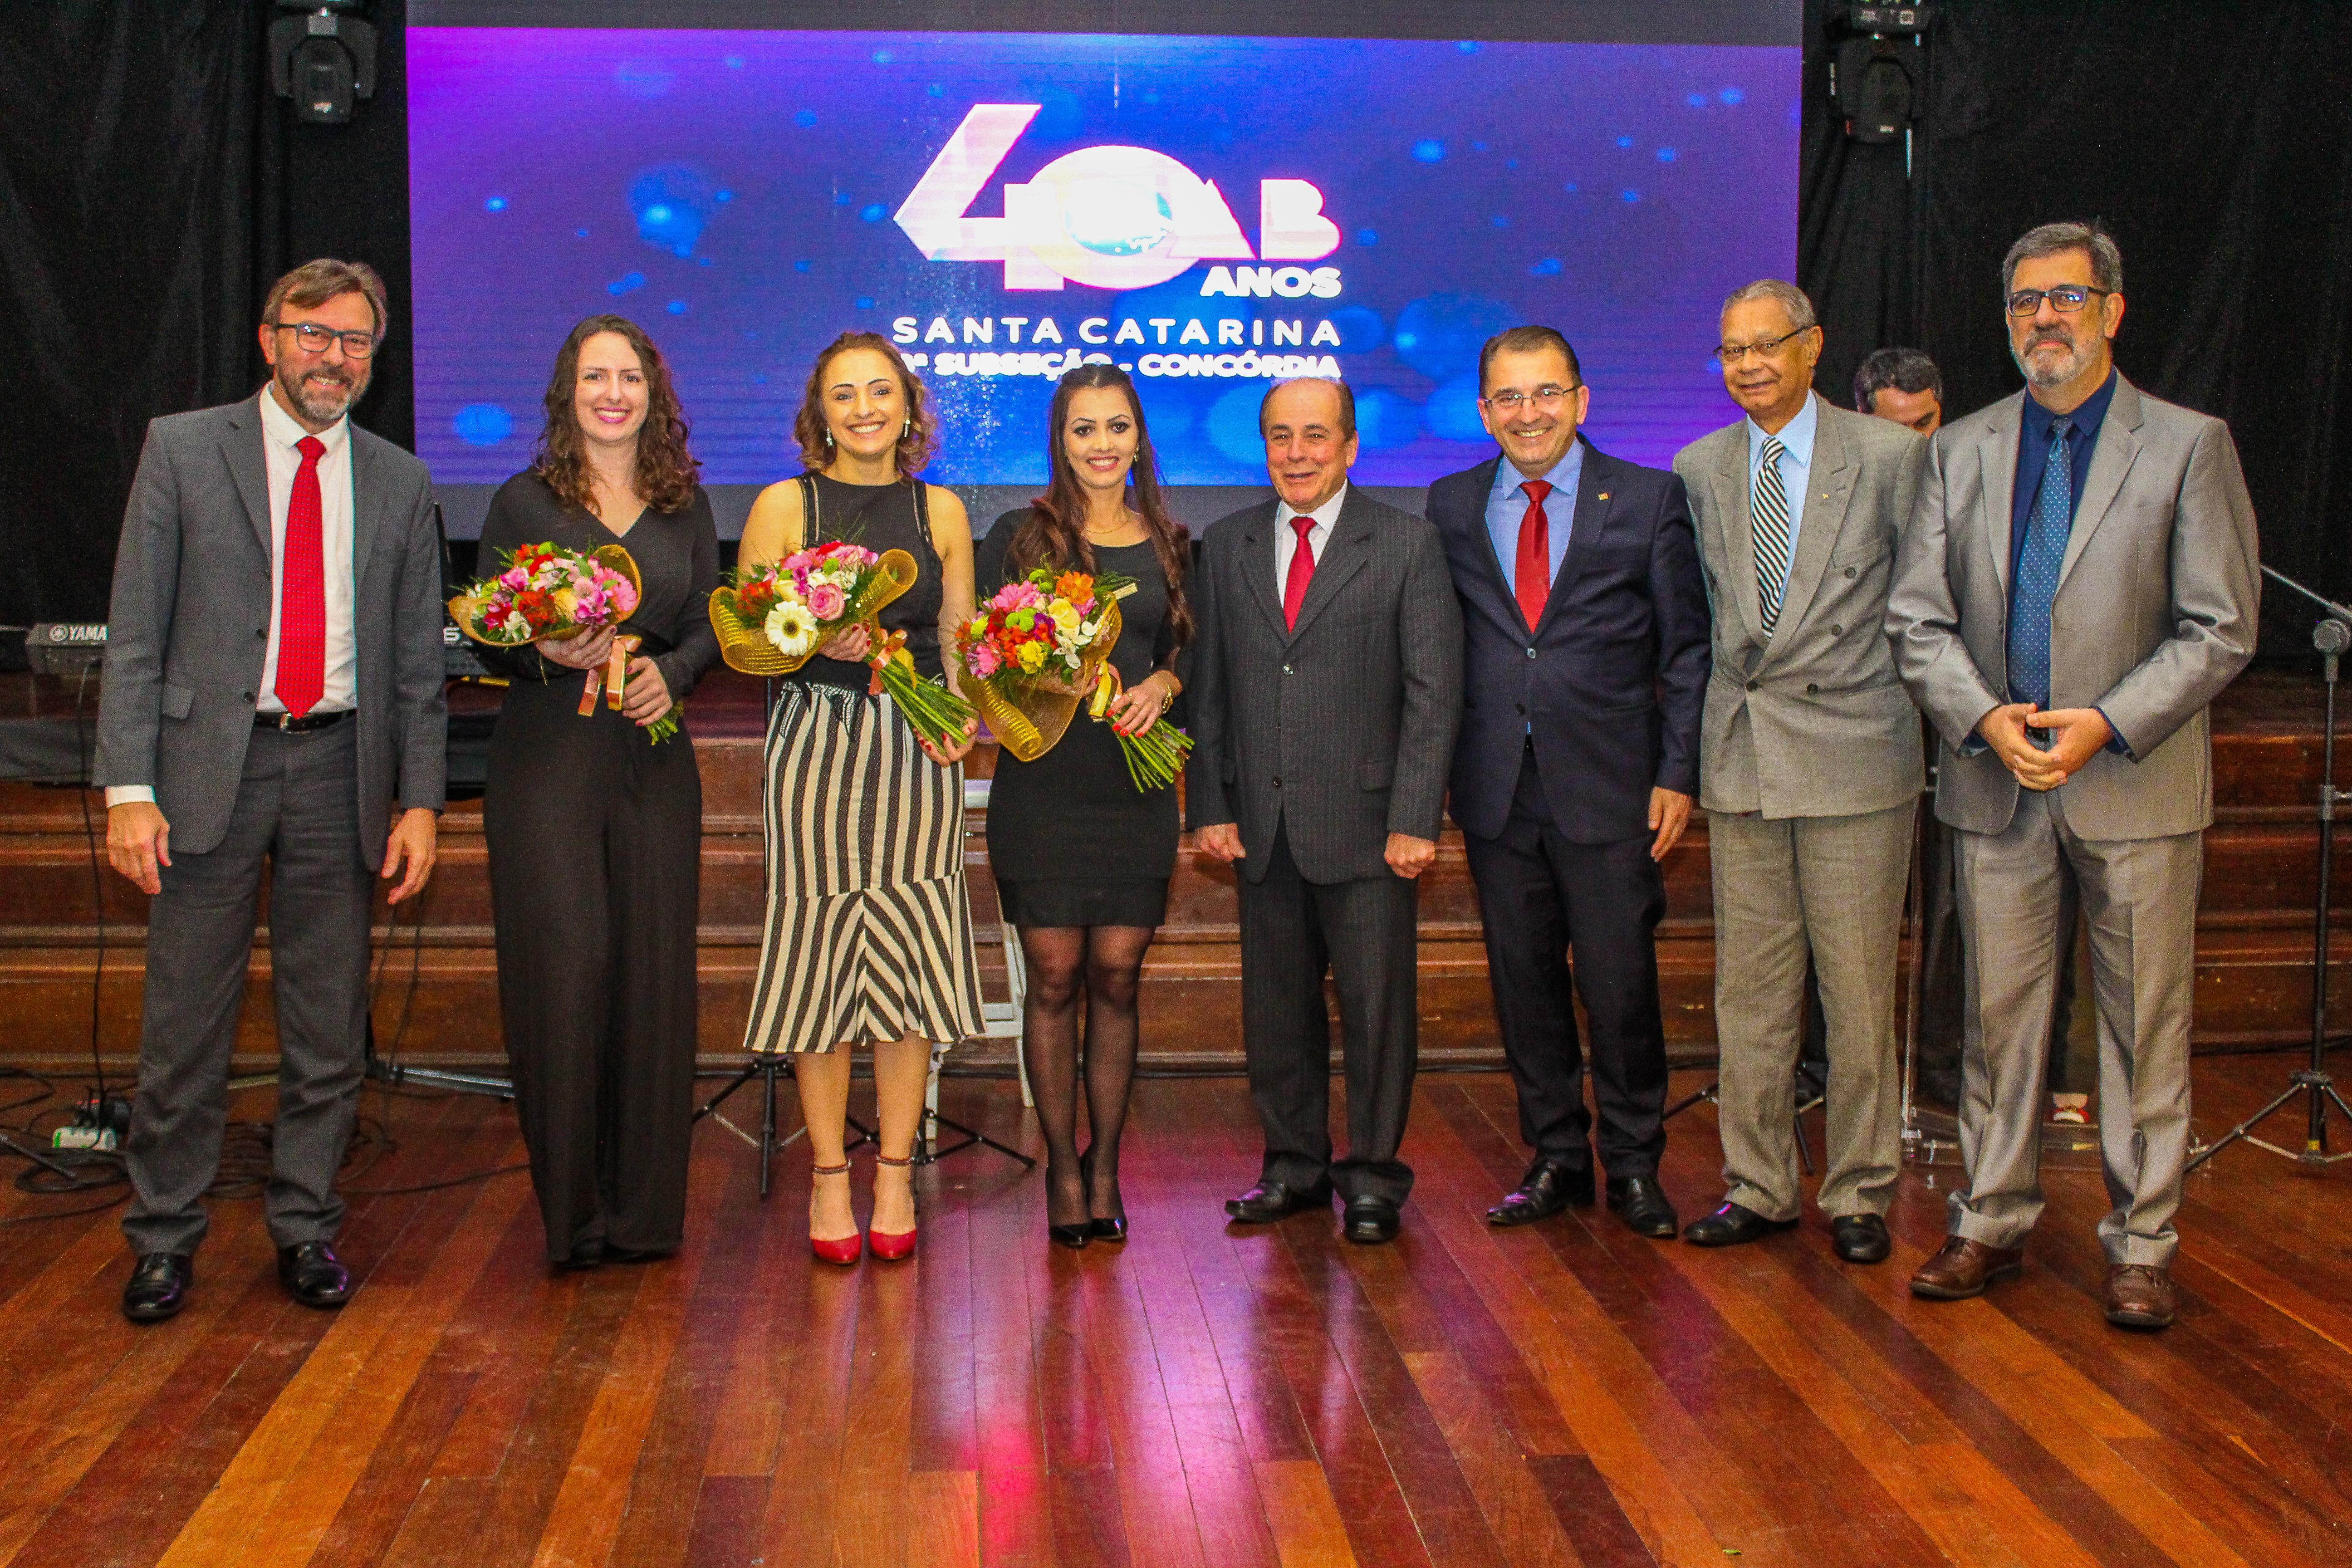 OAB Concórdia comemora 40 anos